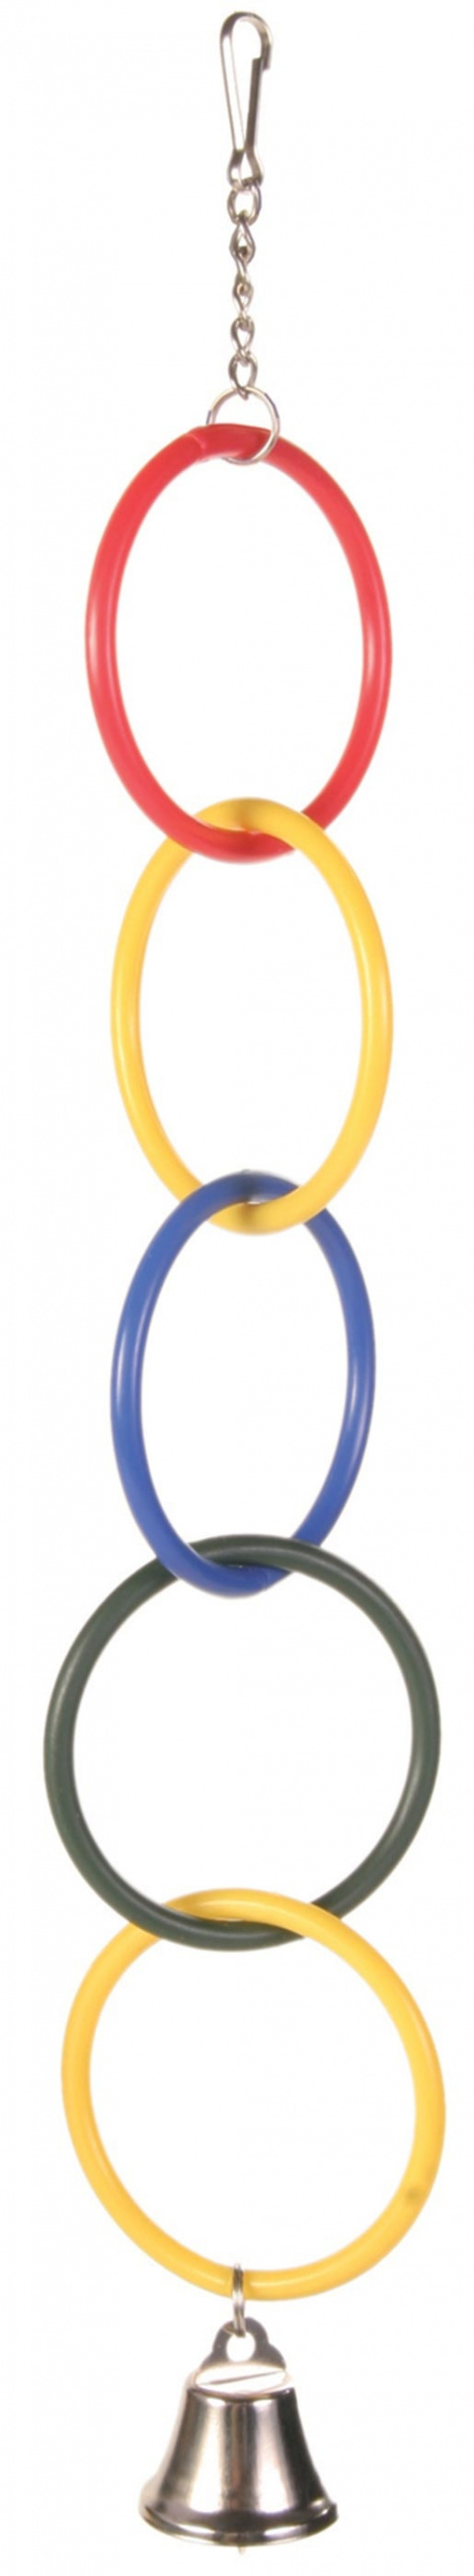 Rotaļlieta putniem - Plastic Rings with Bell